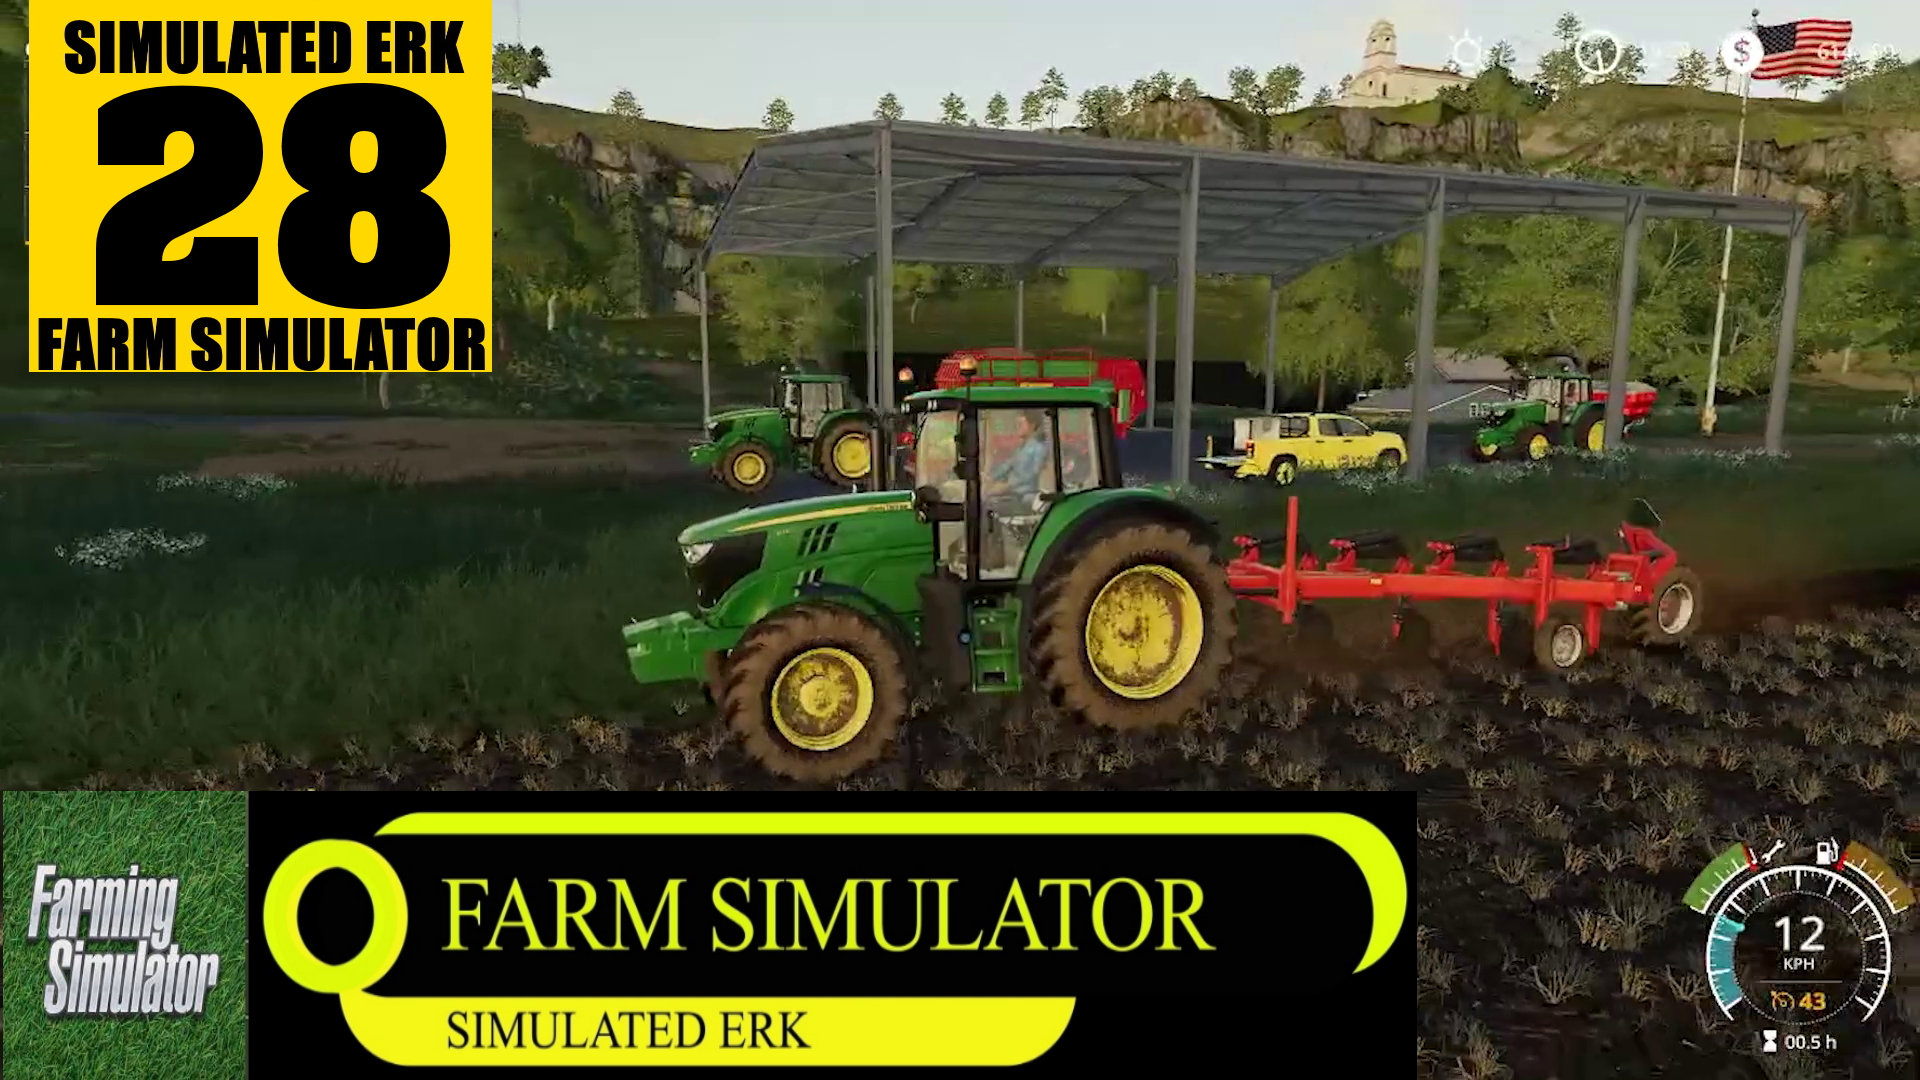 Simulated Erk: Farm Simulator episode 28 | Get To Work, Wayne!